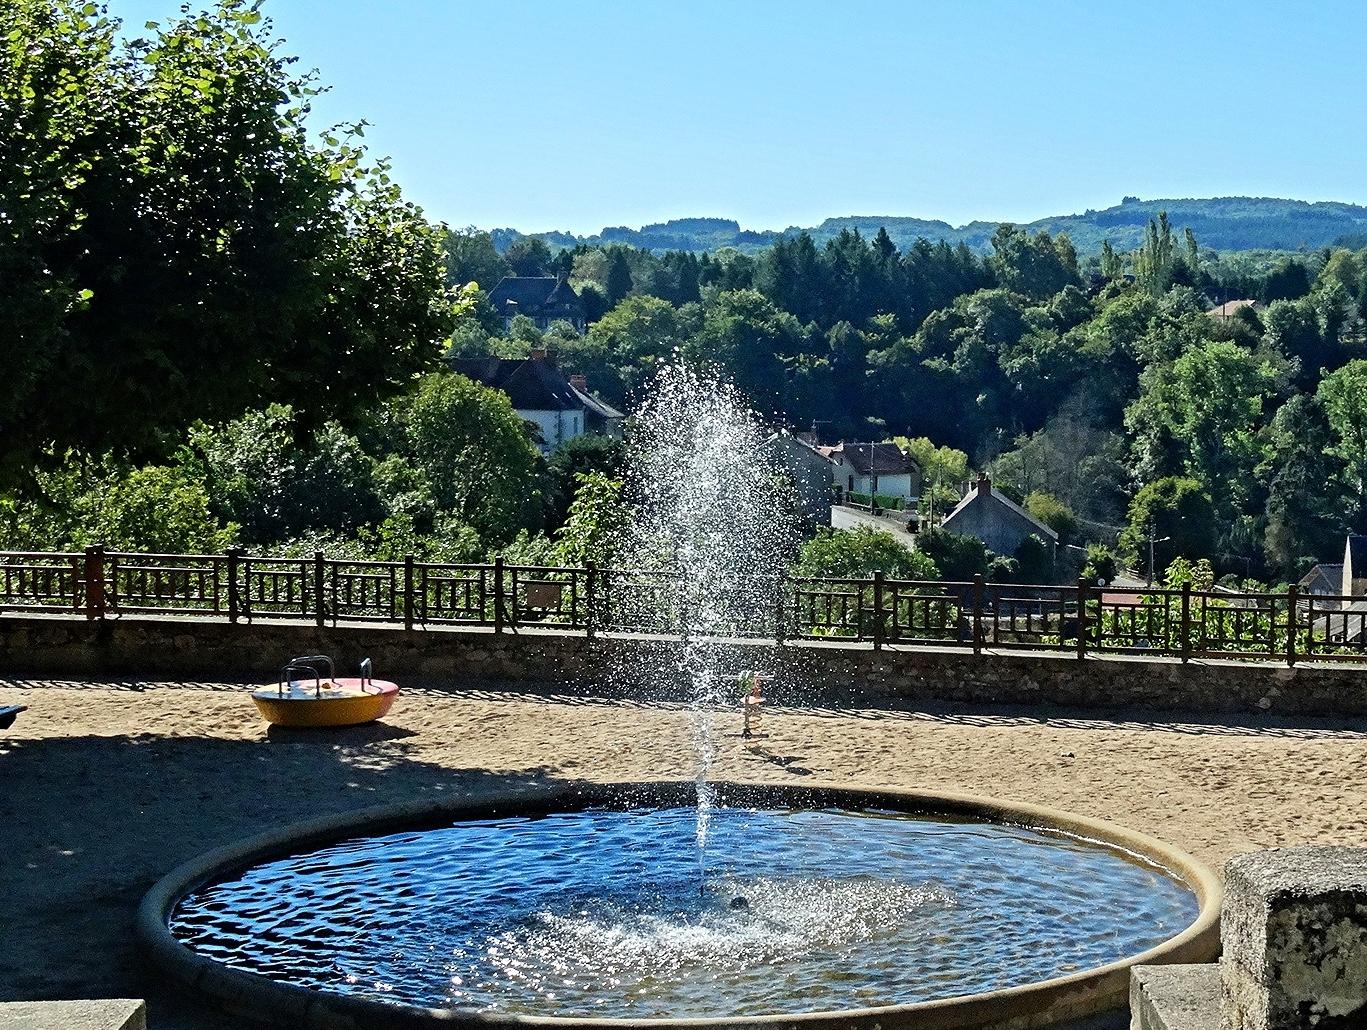 Less Jardins Panoramique